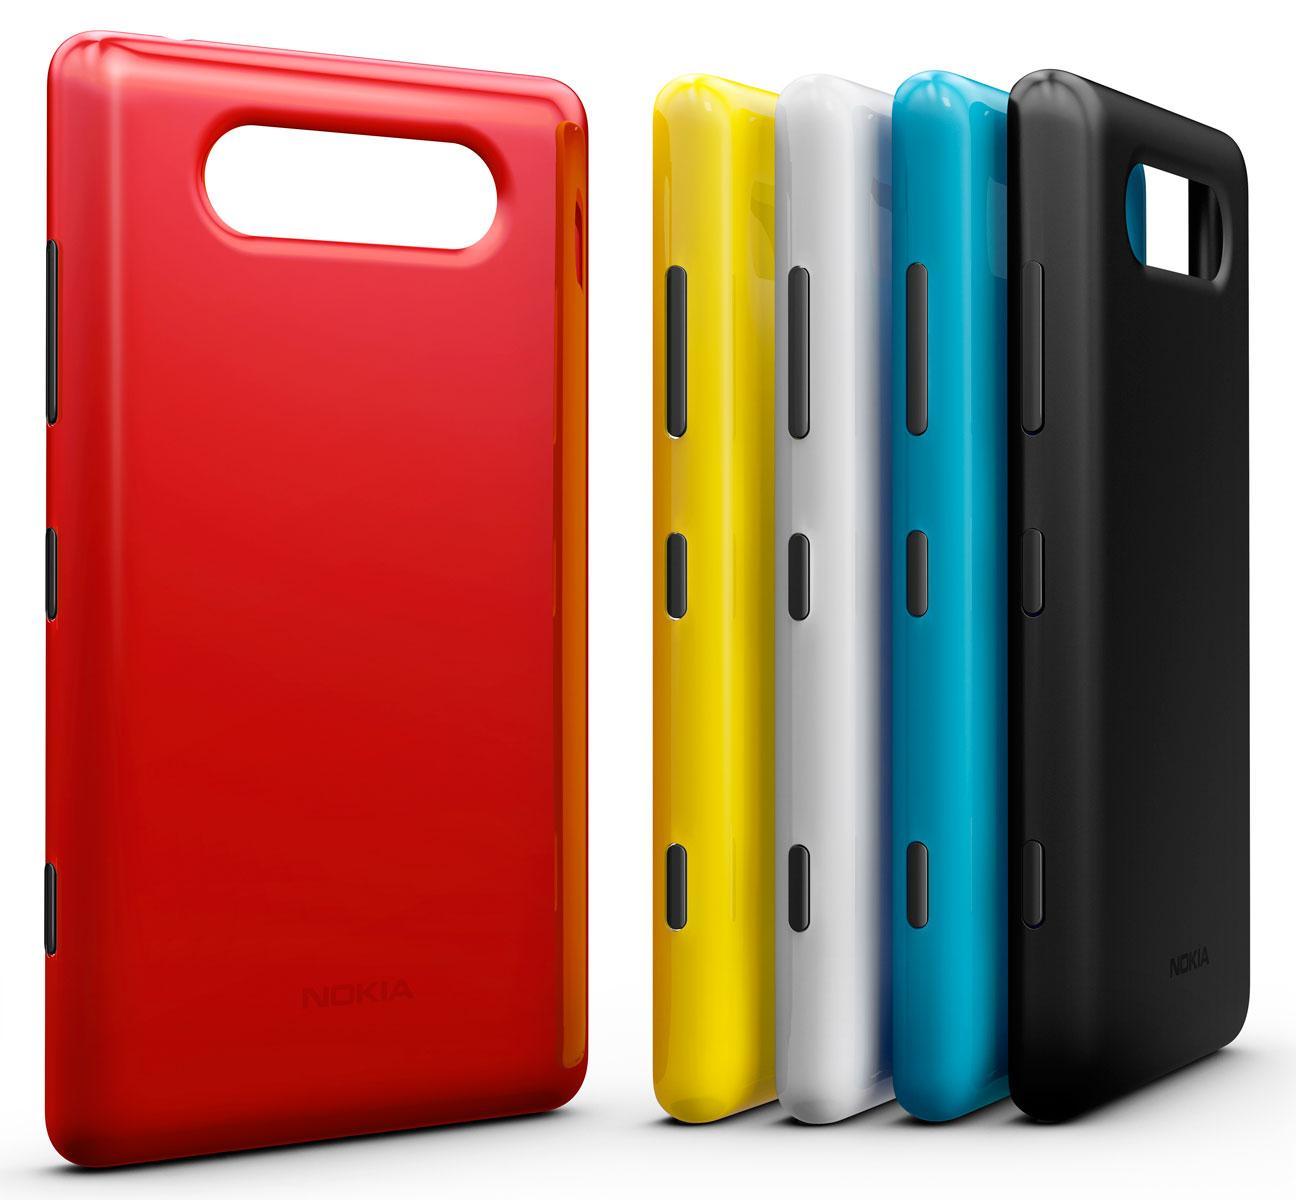 Nokia Lumia 820 rojo carcasas